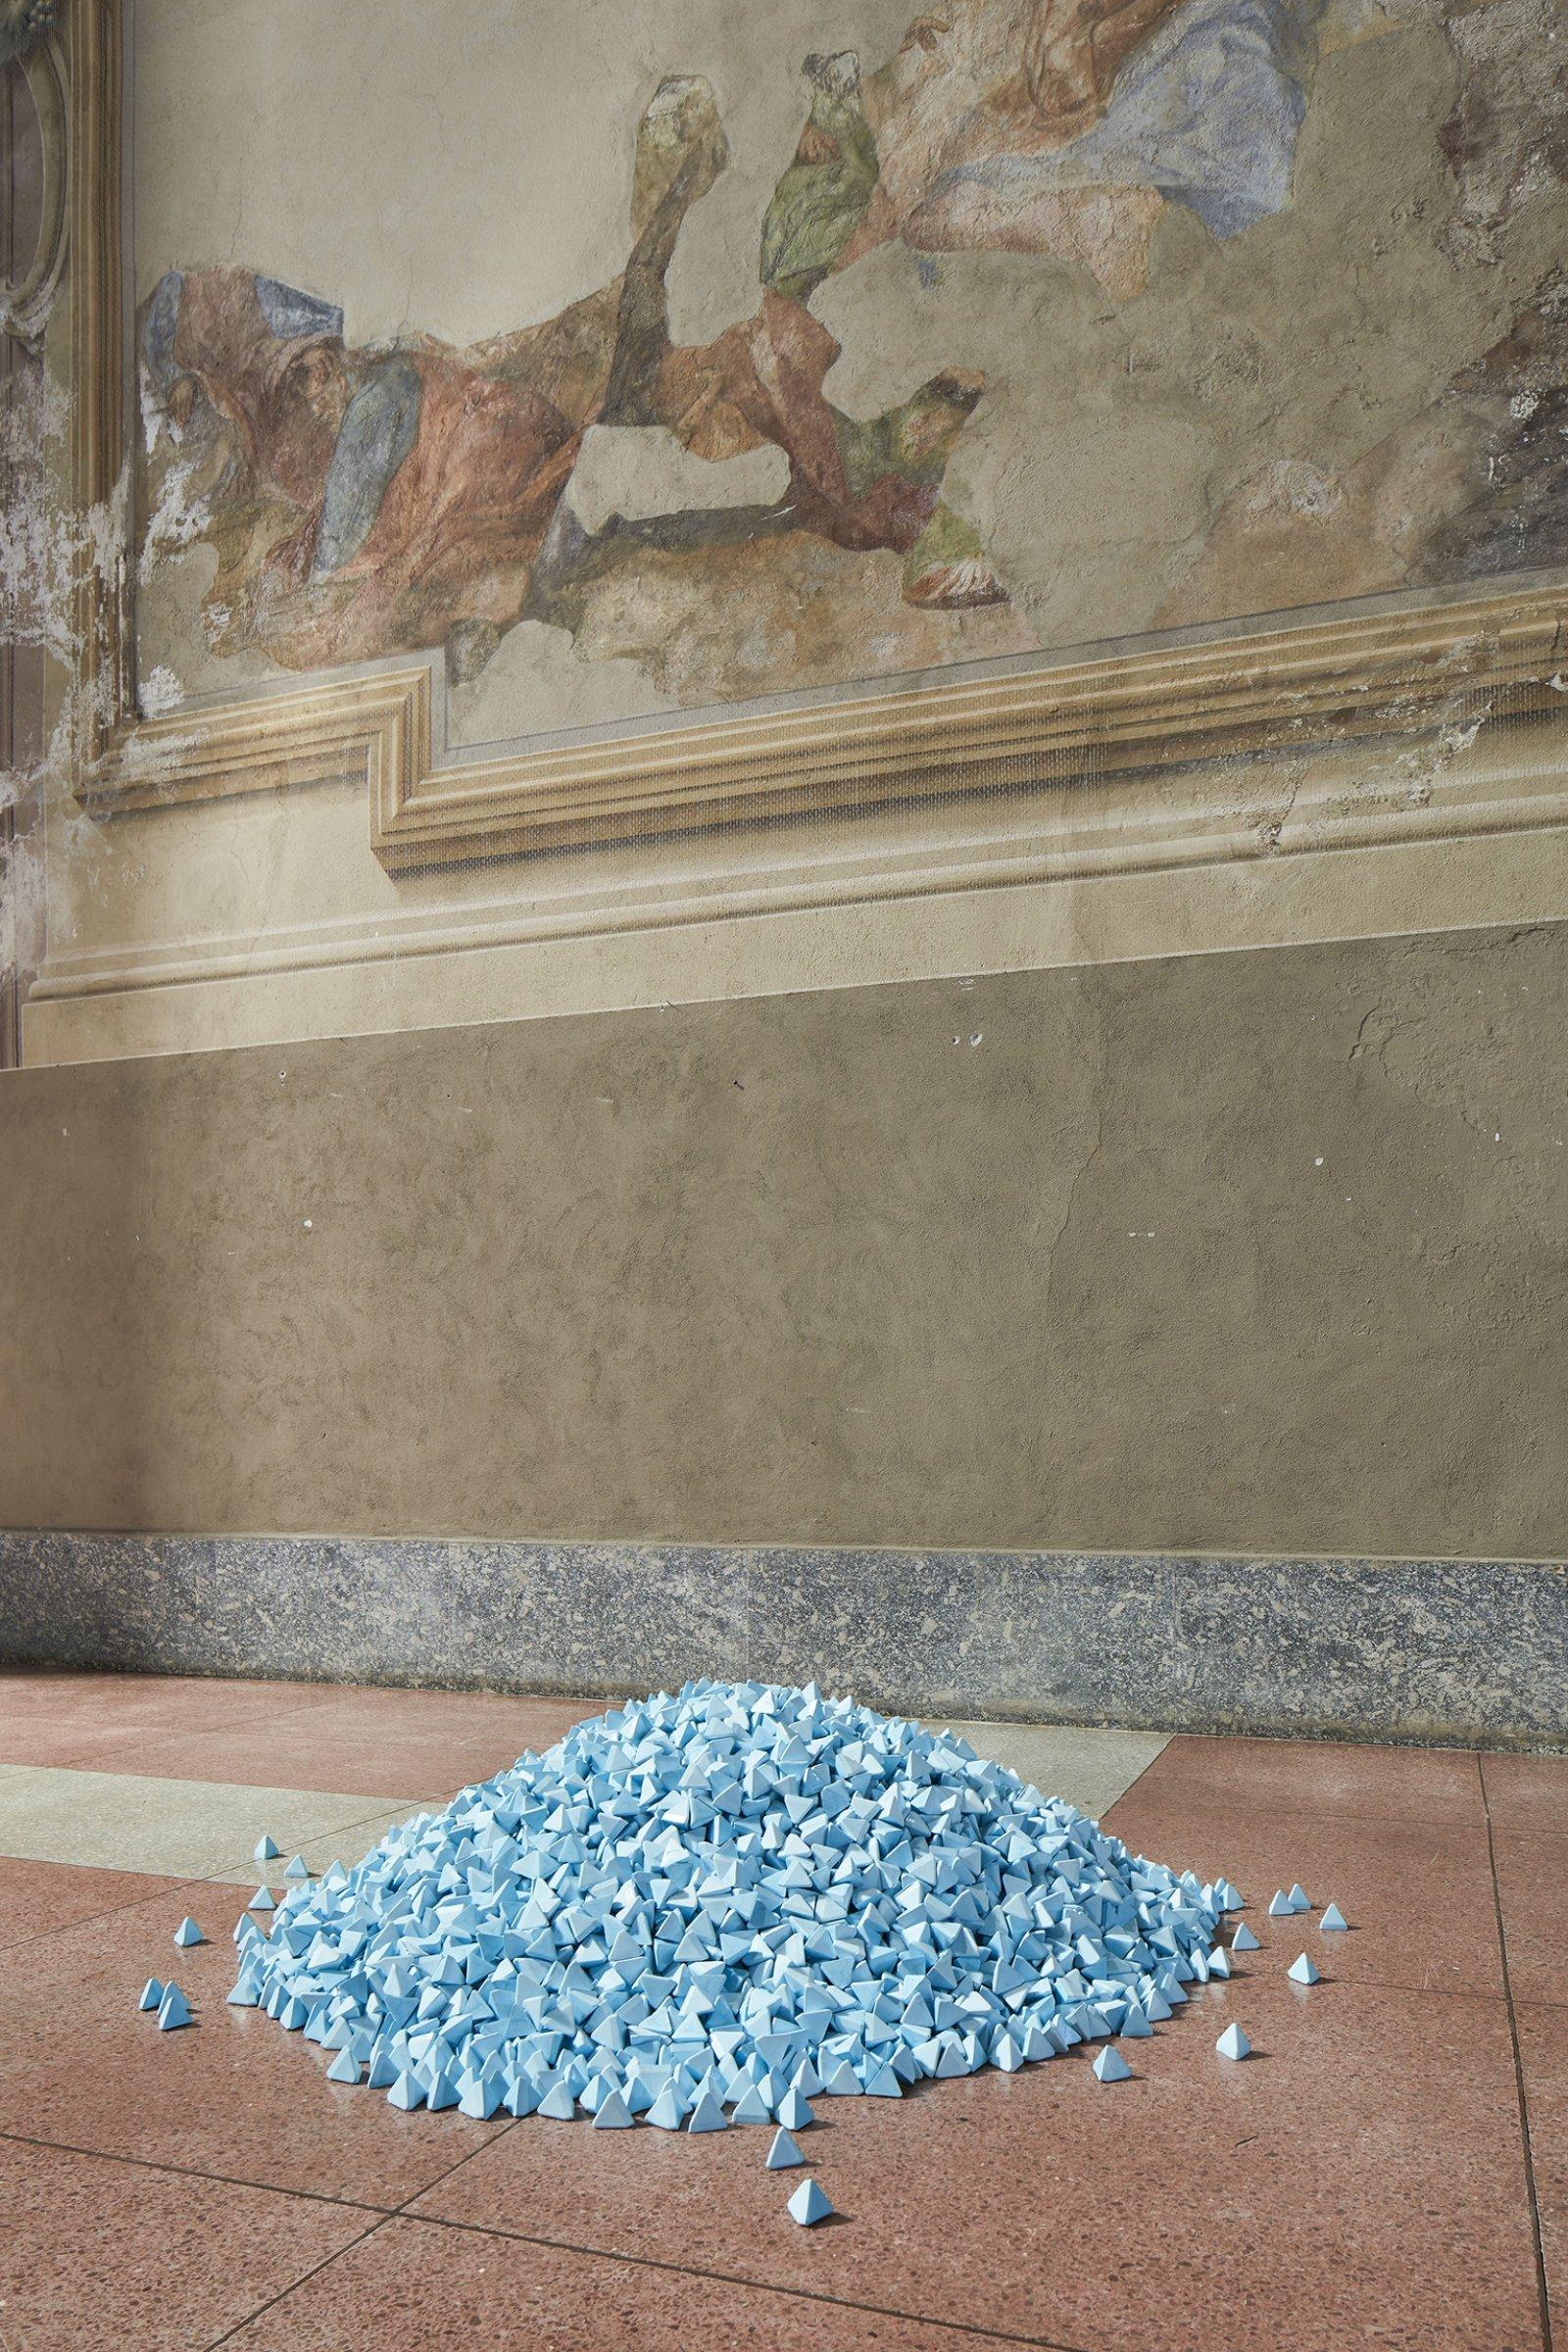 Christina Mackie, People Powder, 2018, animations and plastic media, dimensions variable. Installation view, People Powder, Spazio Culturale Antonio Ratti, ex Chiesa di San Francesco, Como, 2018 by Christina Mackie